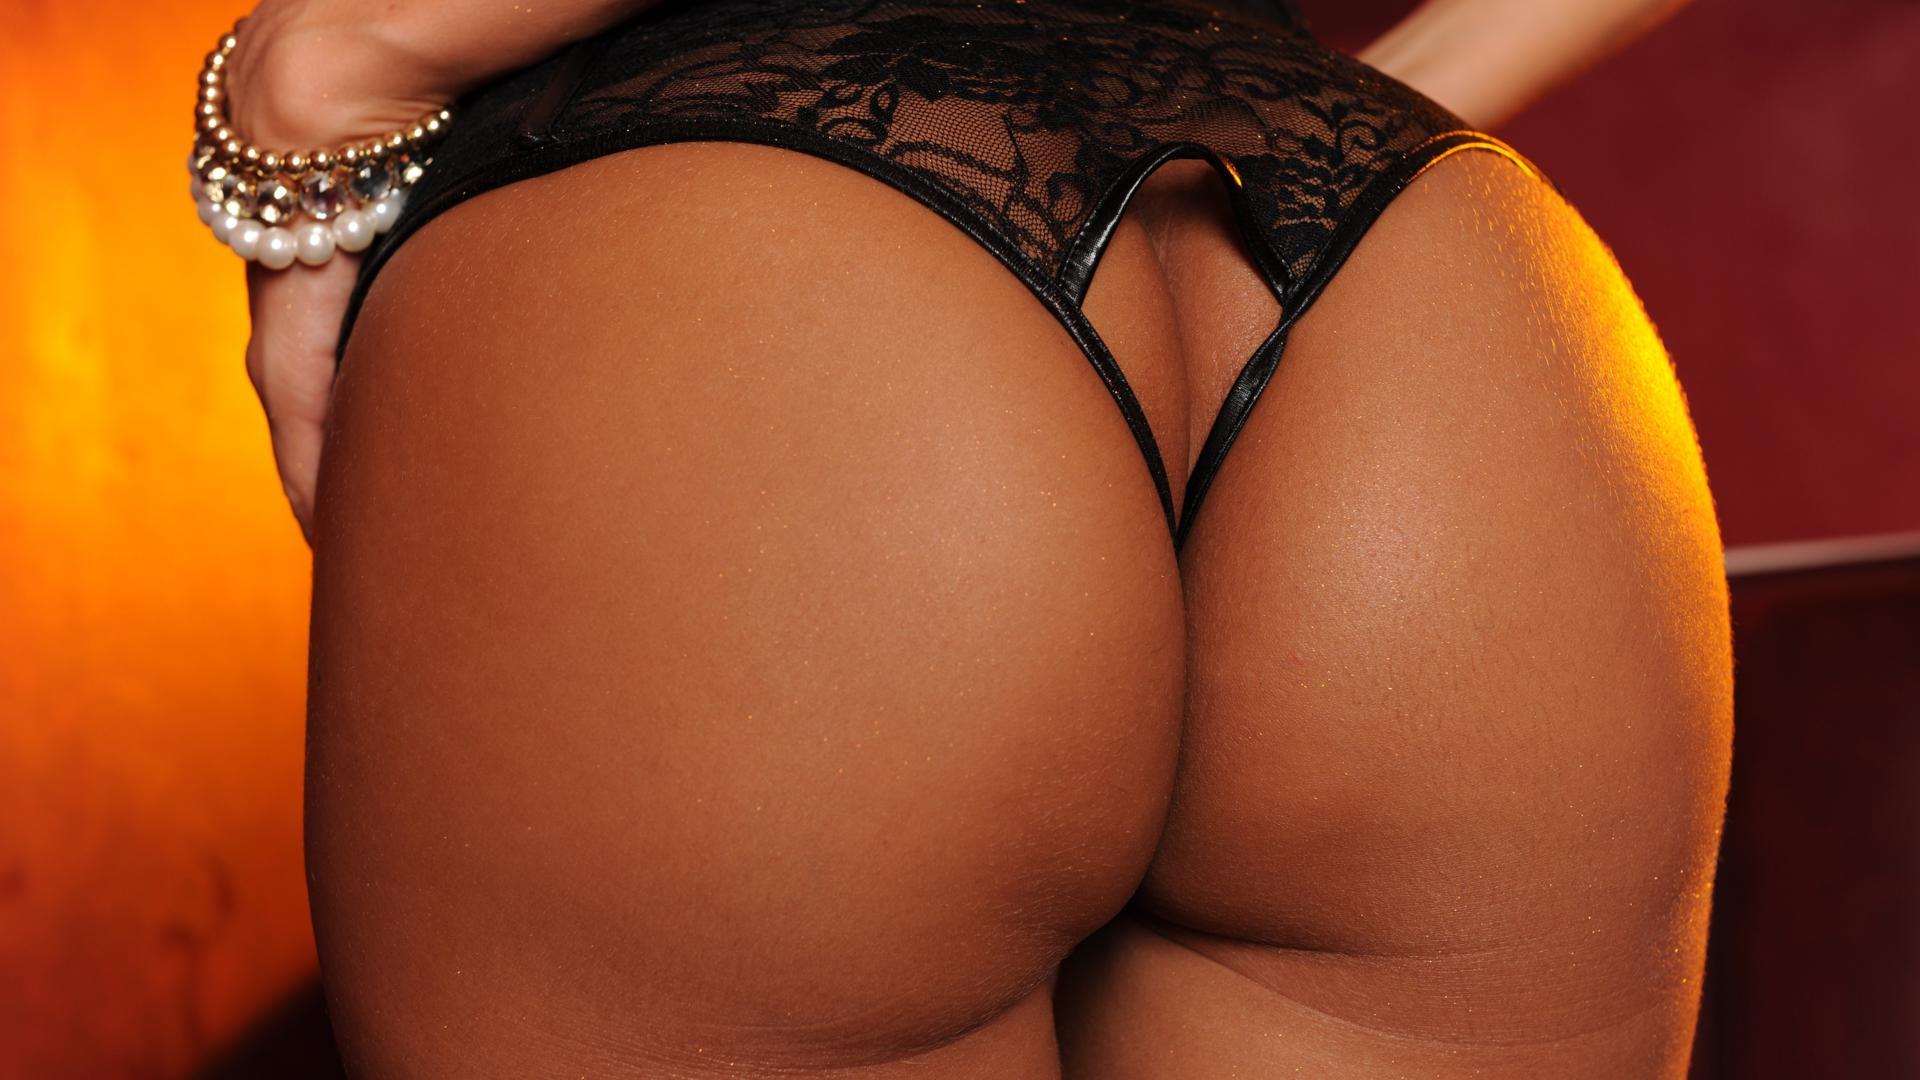 Big round sexy ass